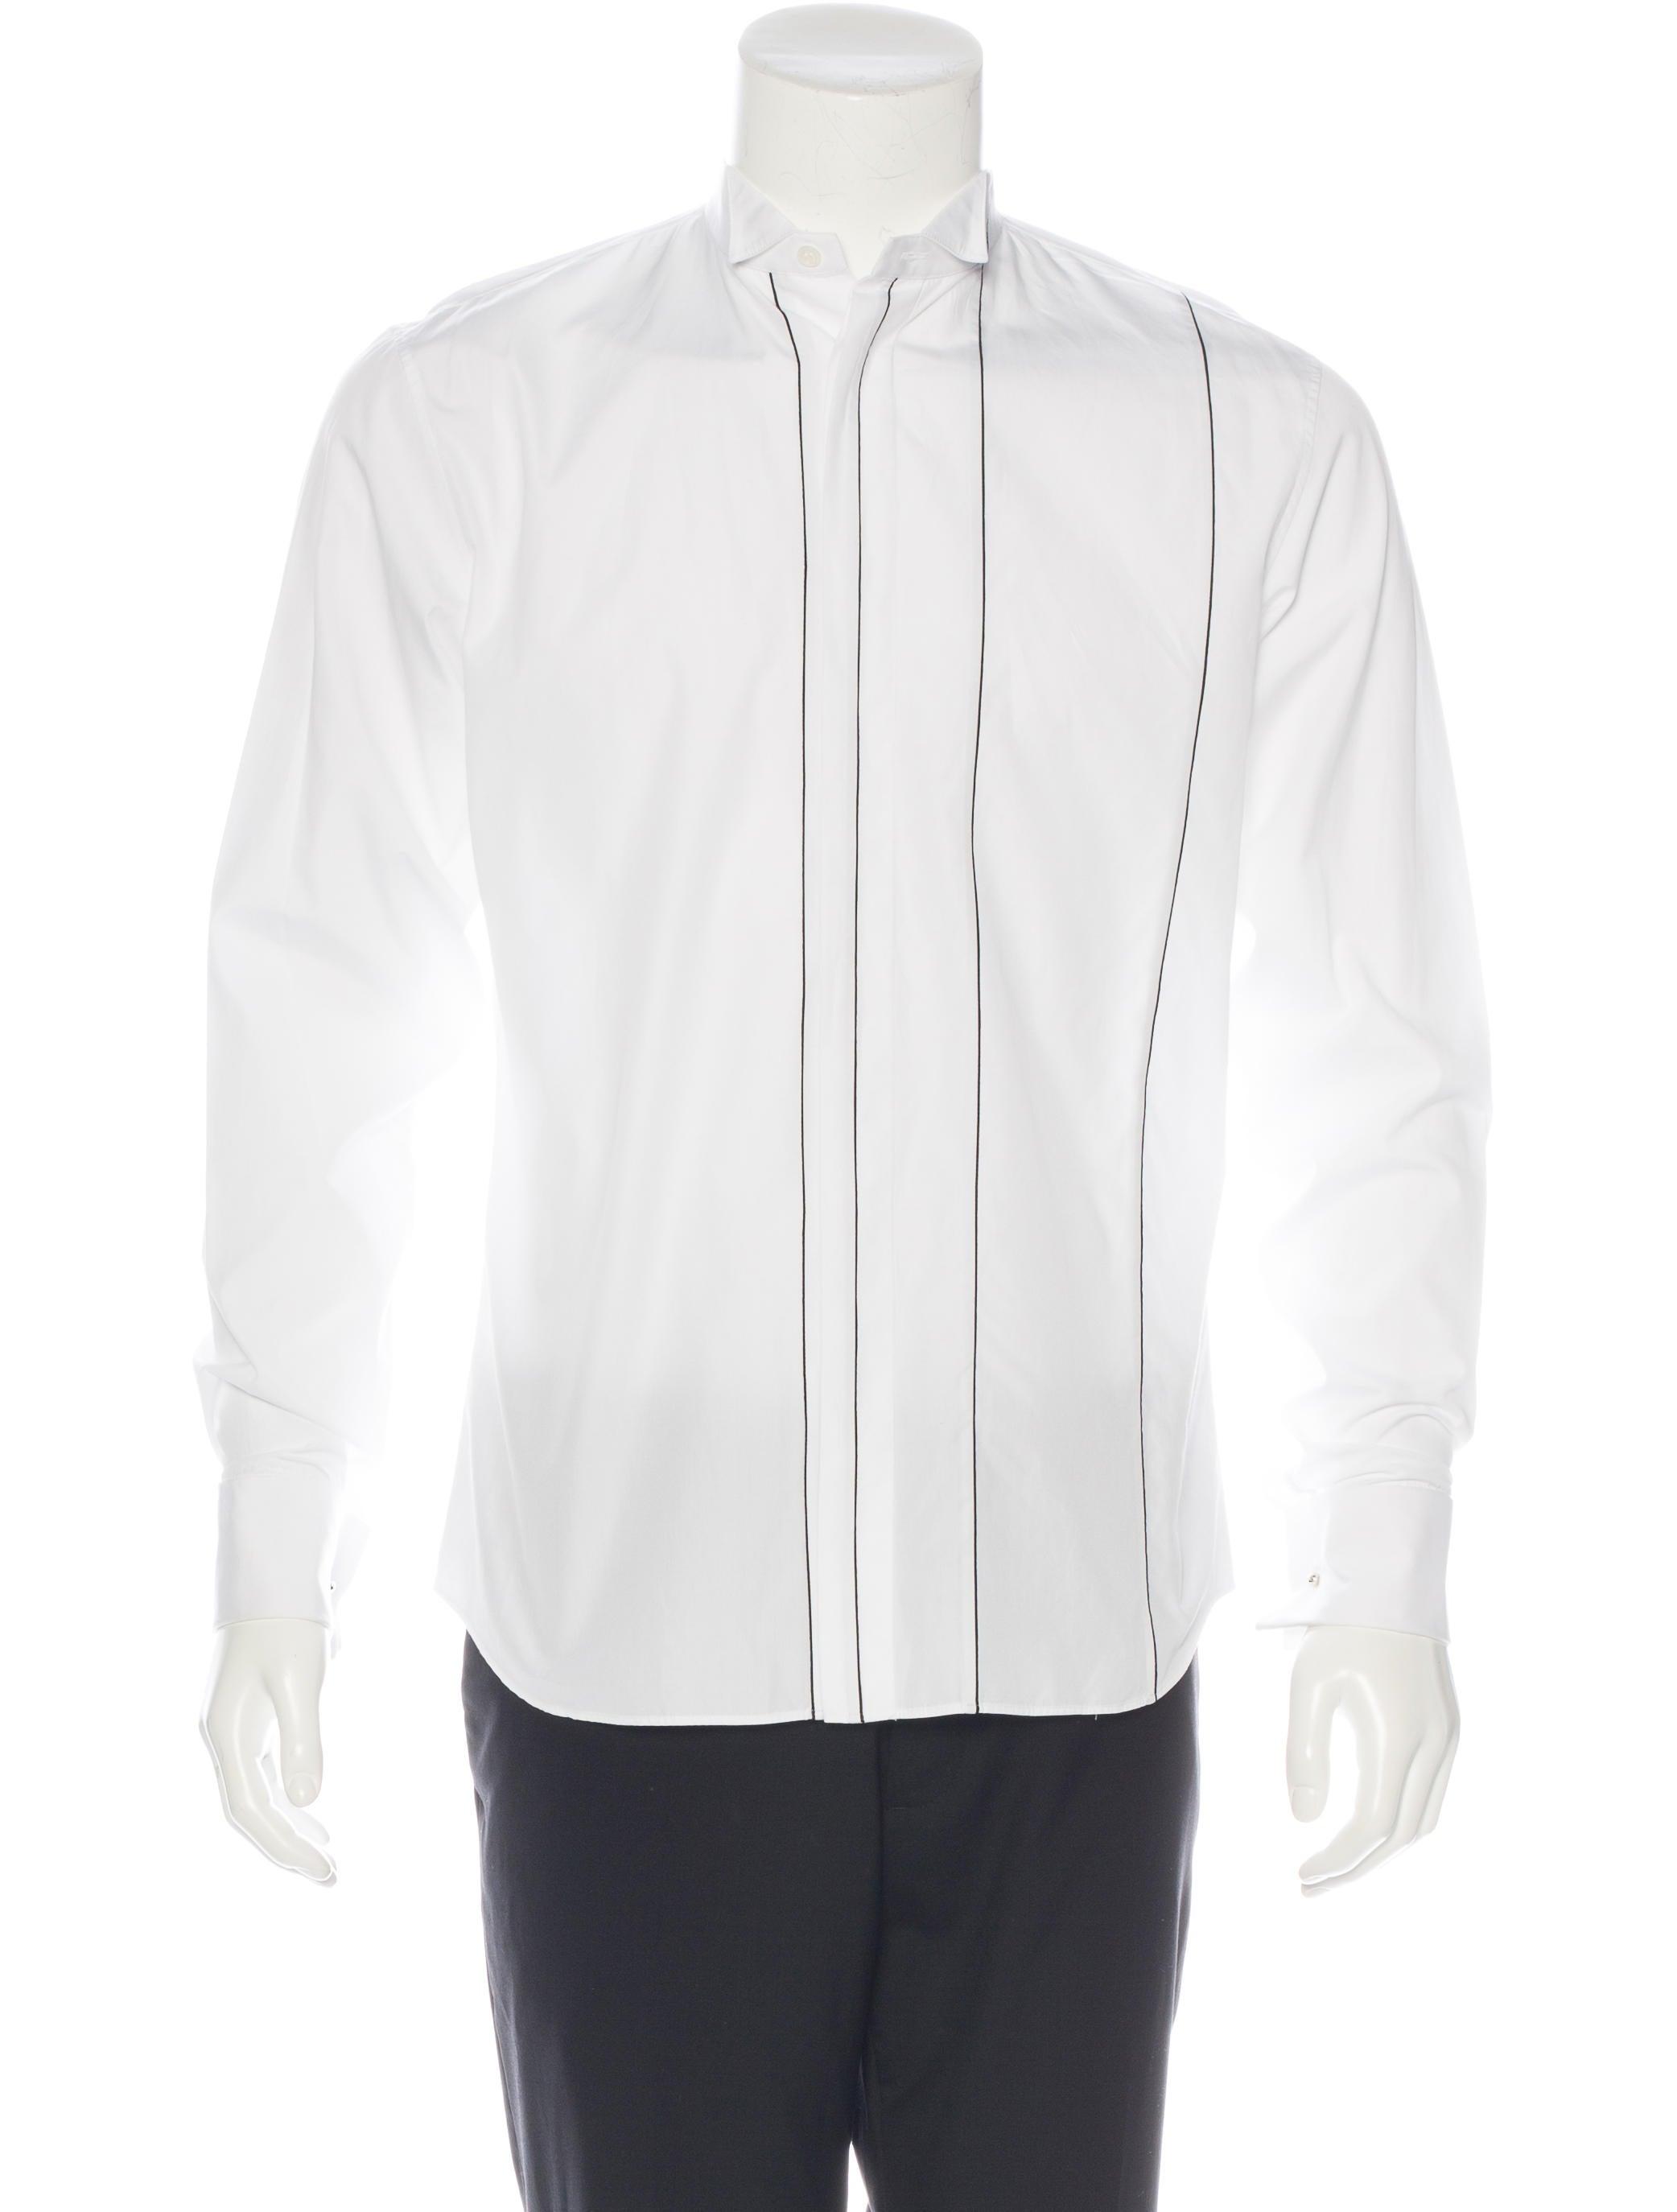 Dior Homme Striped French Cuff Shirt Clothing Hmm23160